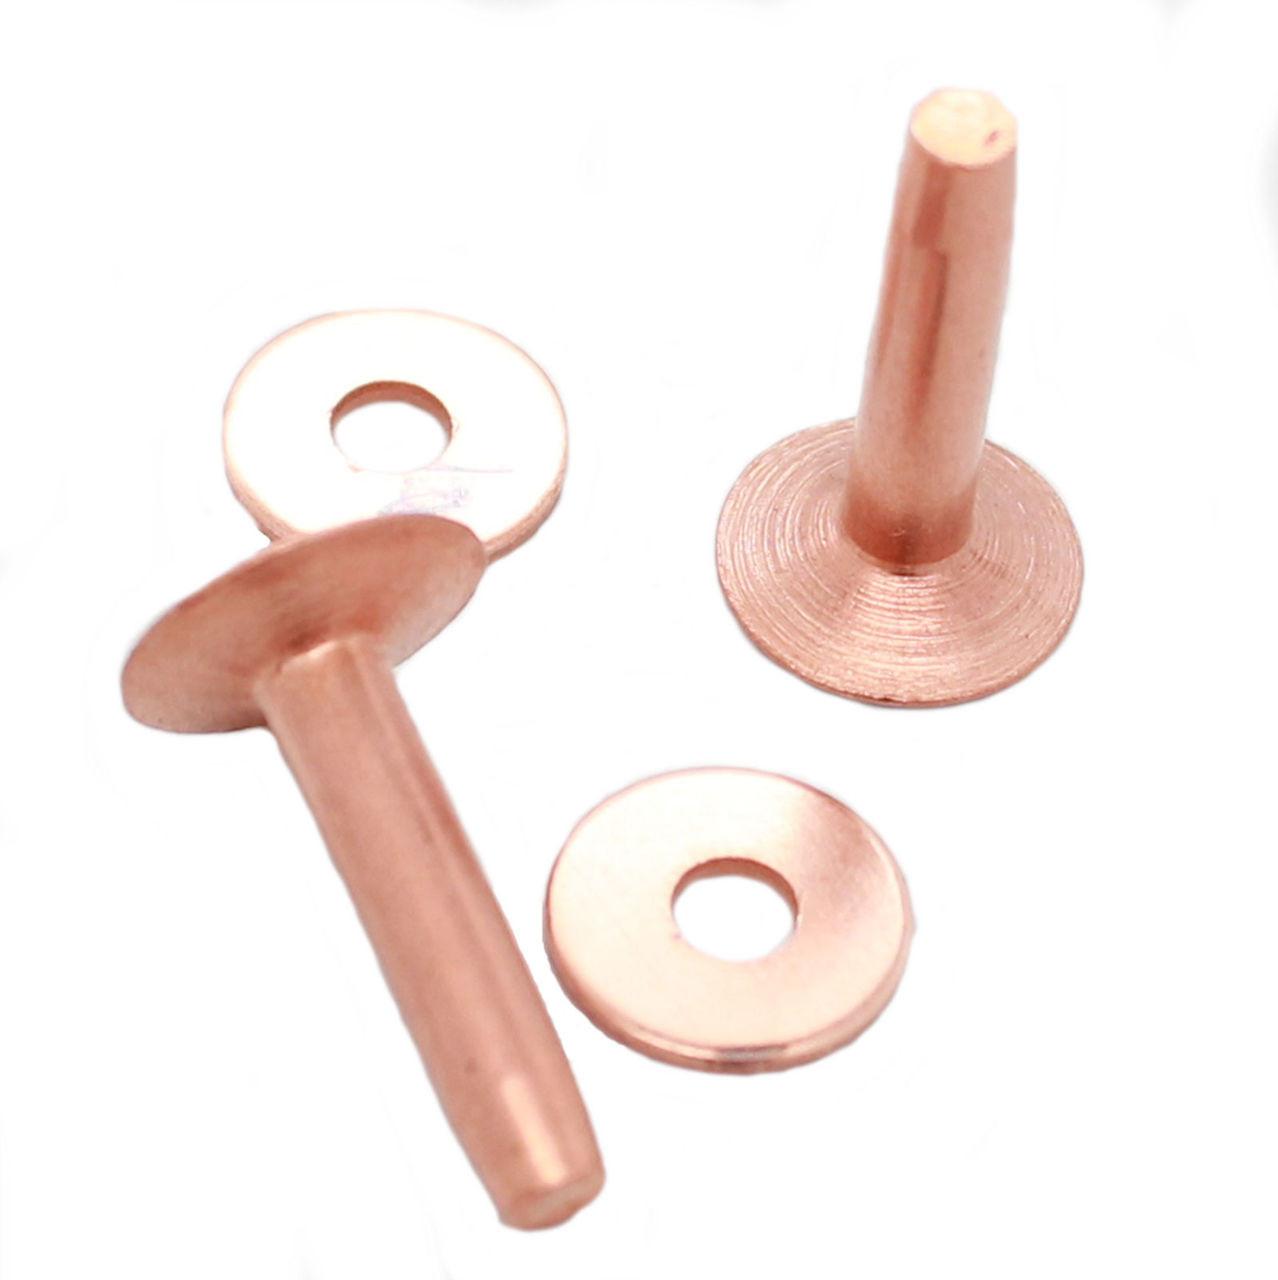 Osborne Copper Rivets 1 lb box (Appx. 135 Count) Size 10